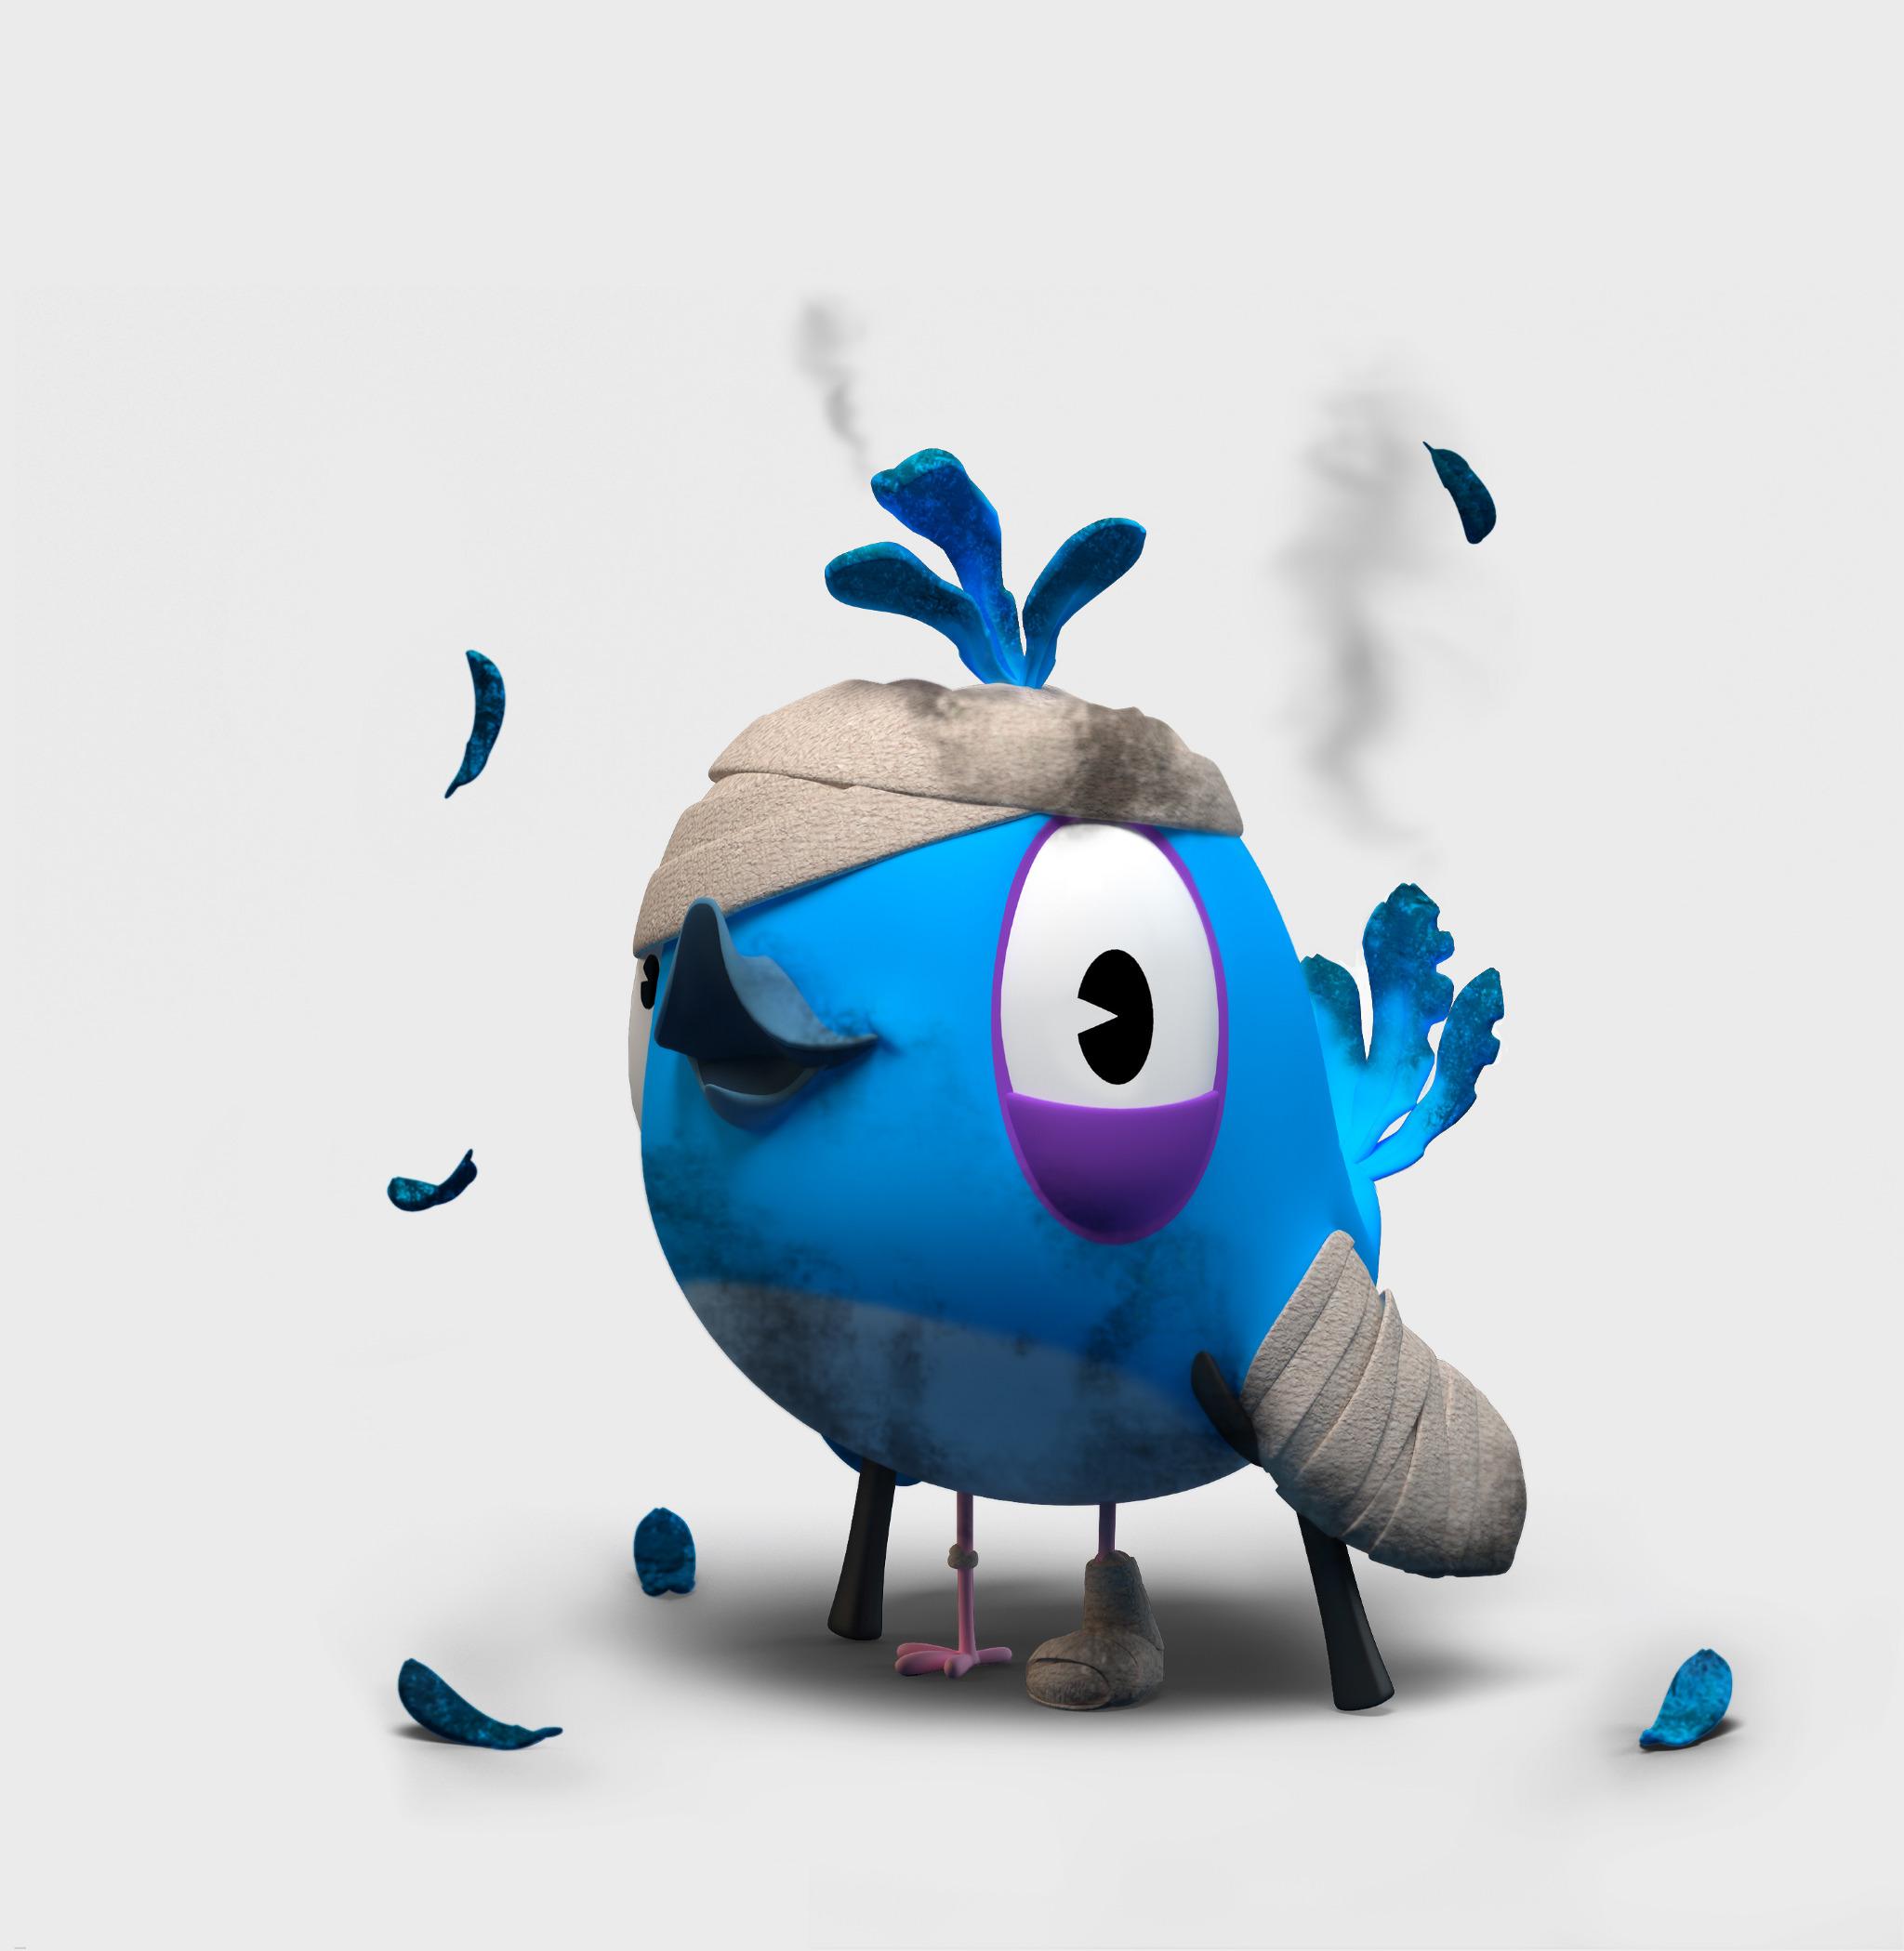 Twitter-Bird-Bloomberg-Businessweek-Survivor_o.jpg